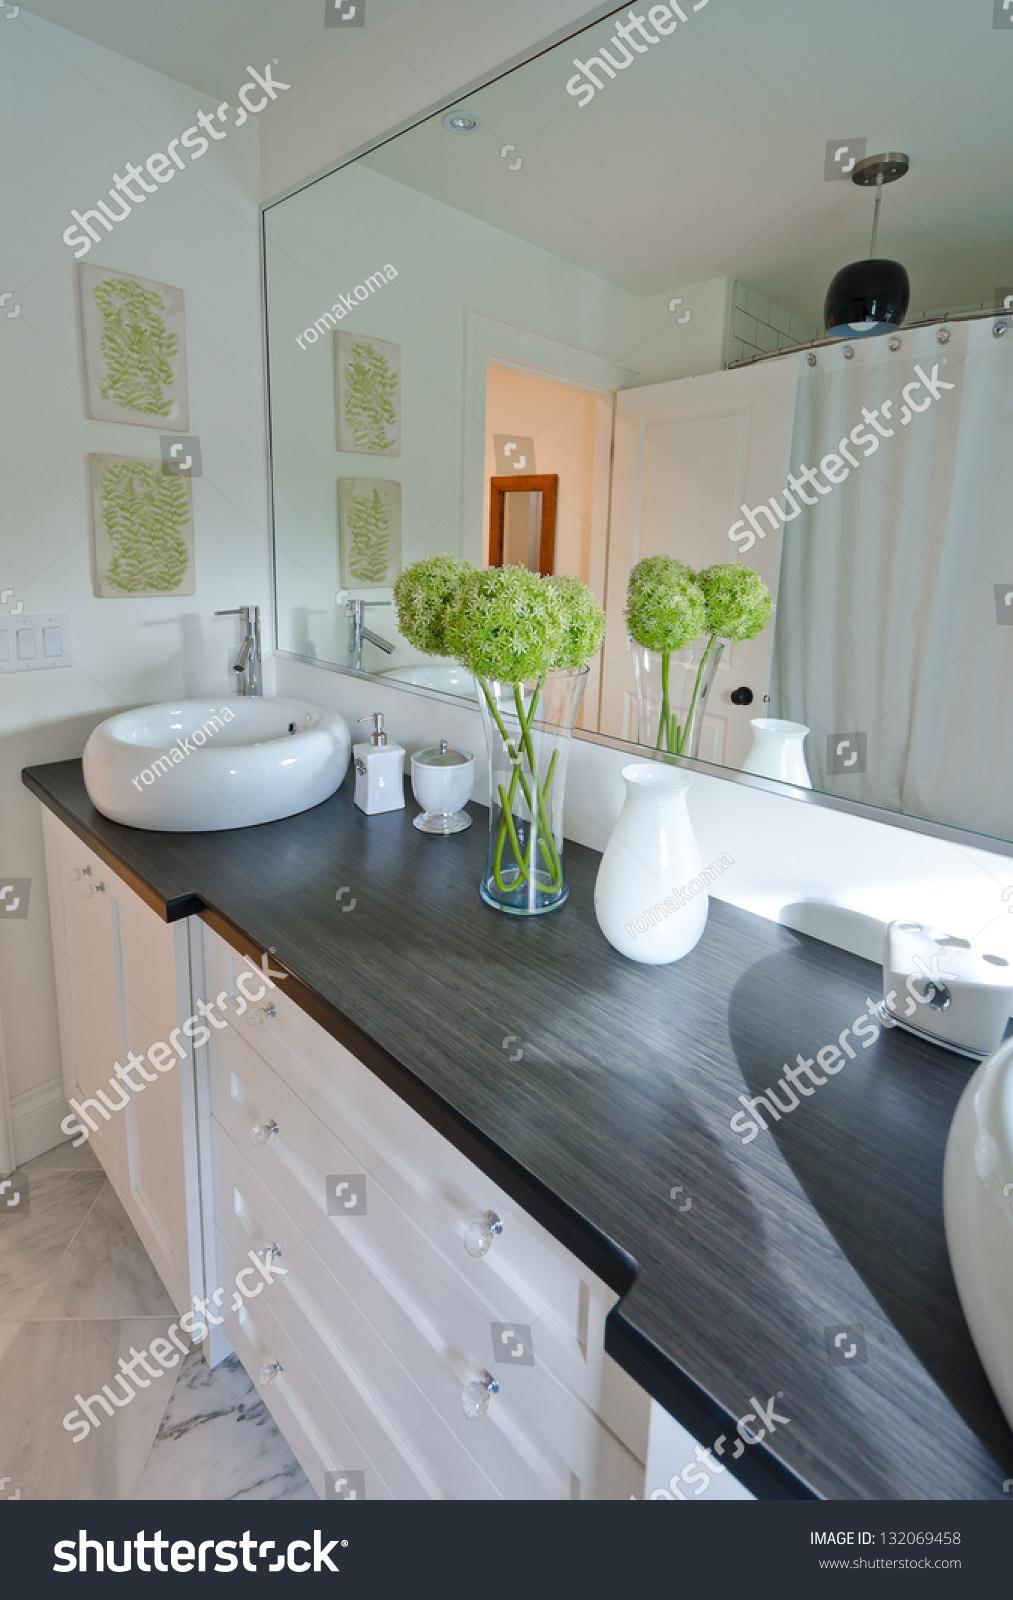 Washbasin Bathroom sink  All architecture and design